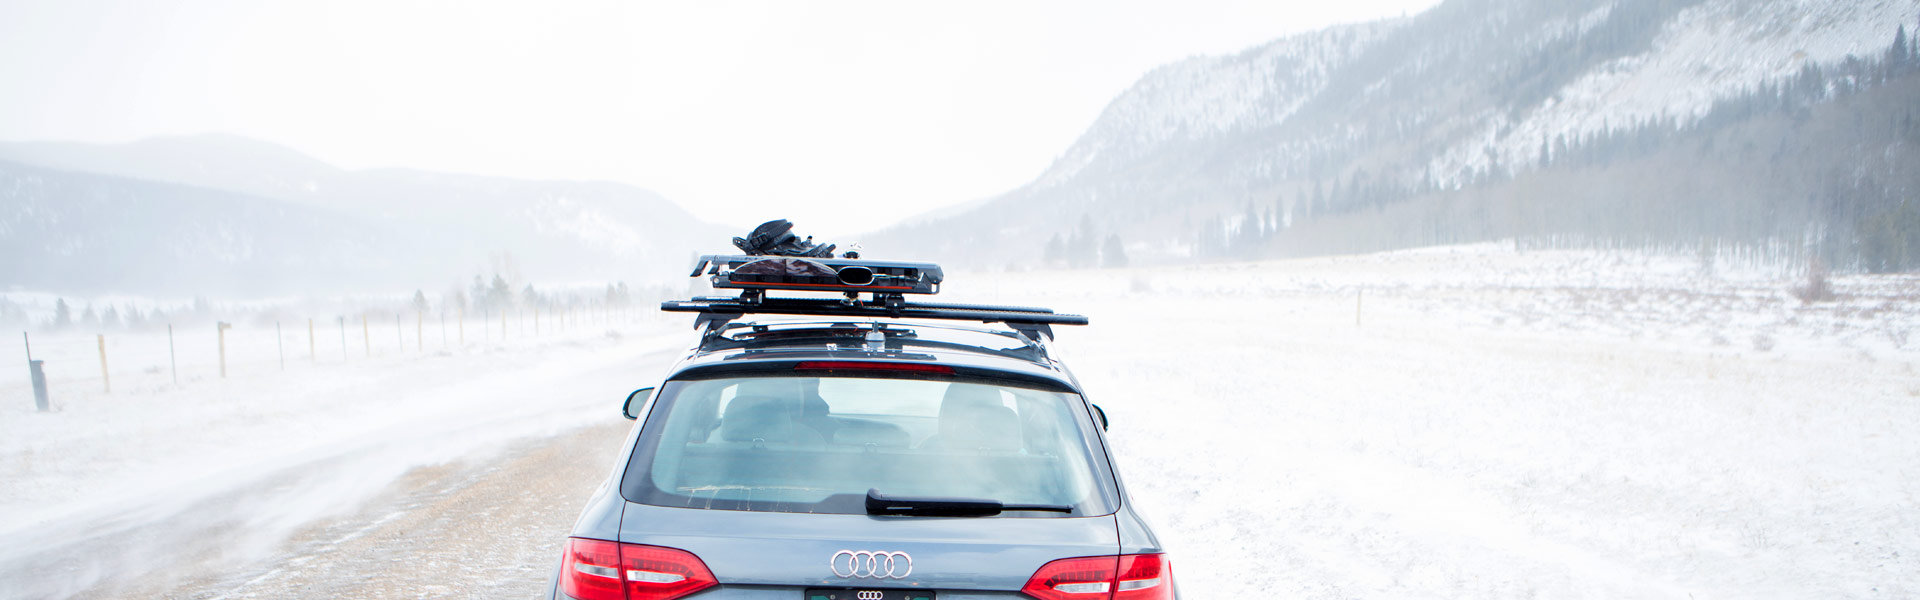 kuat grip ski snowboard rack